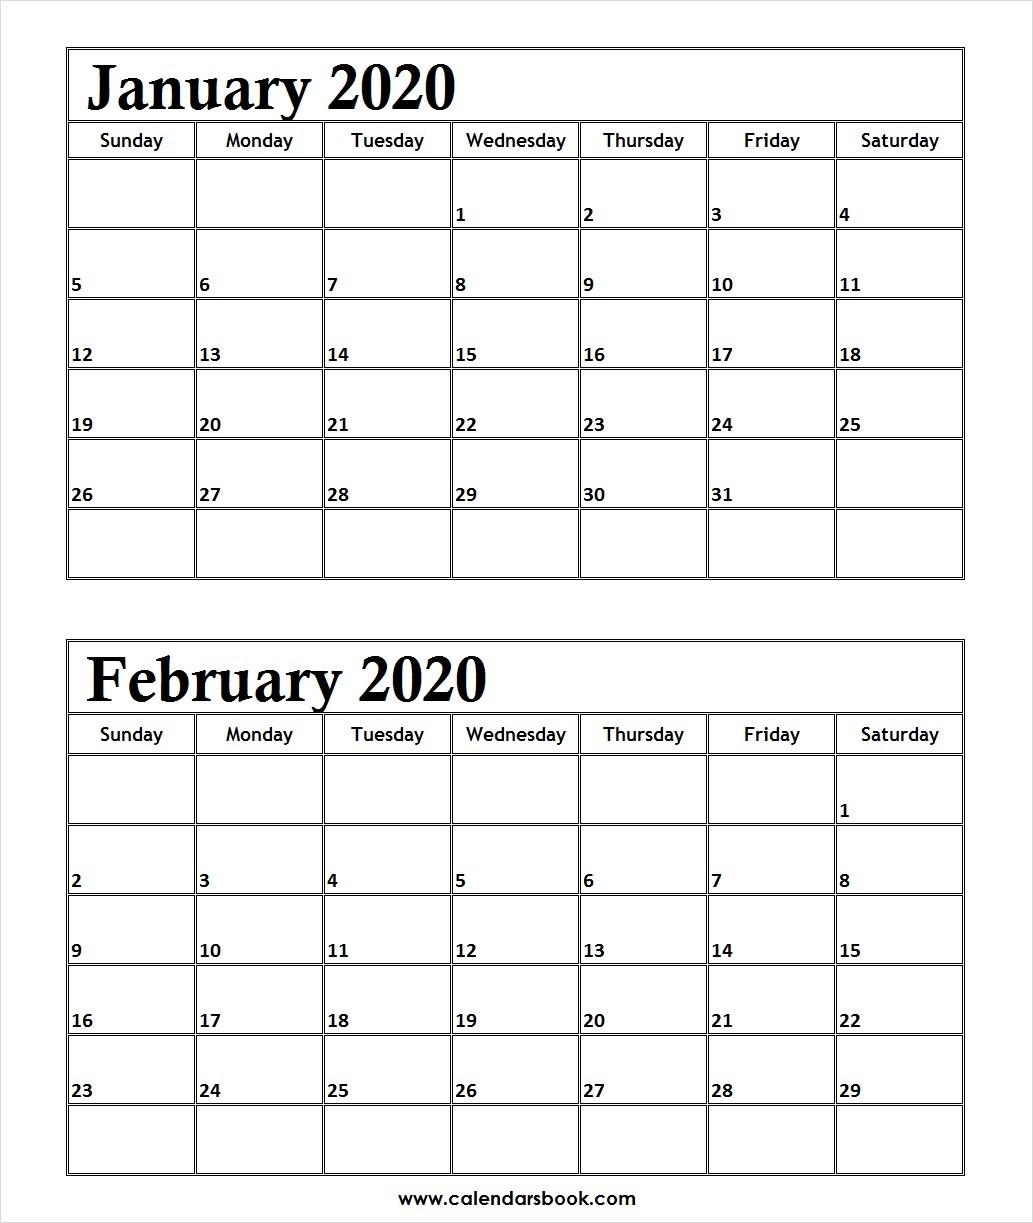 Print January February 2020 Calendar Template | 2 Month Calendar-January And February 2020 Calendar